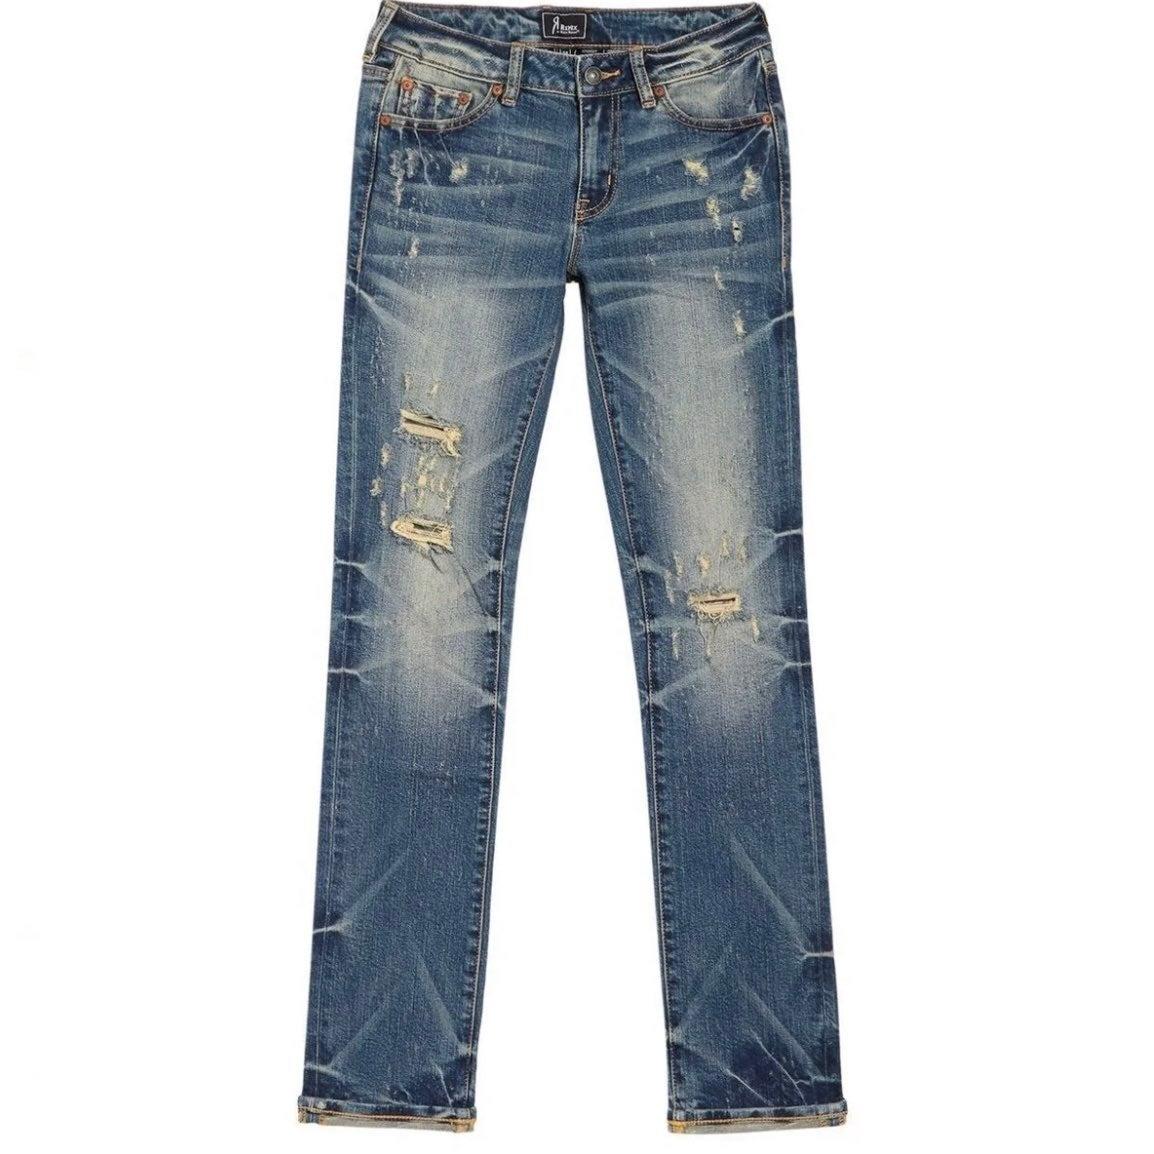 Rock Revival women's straight leg jeans